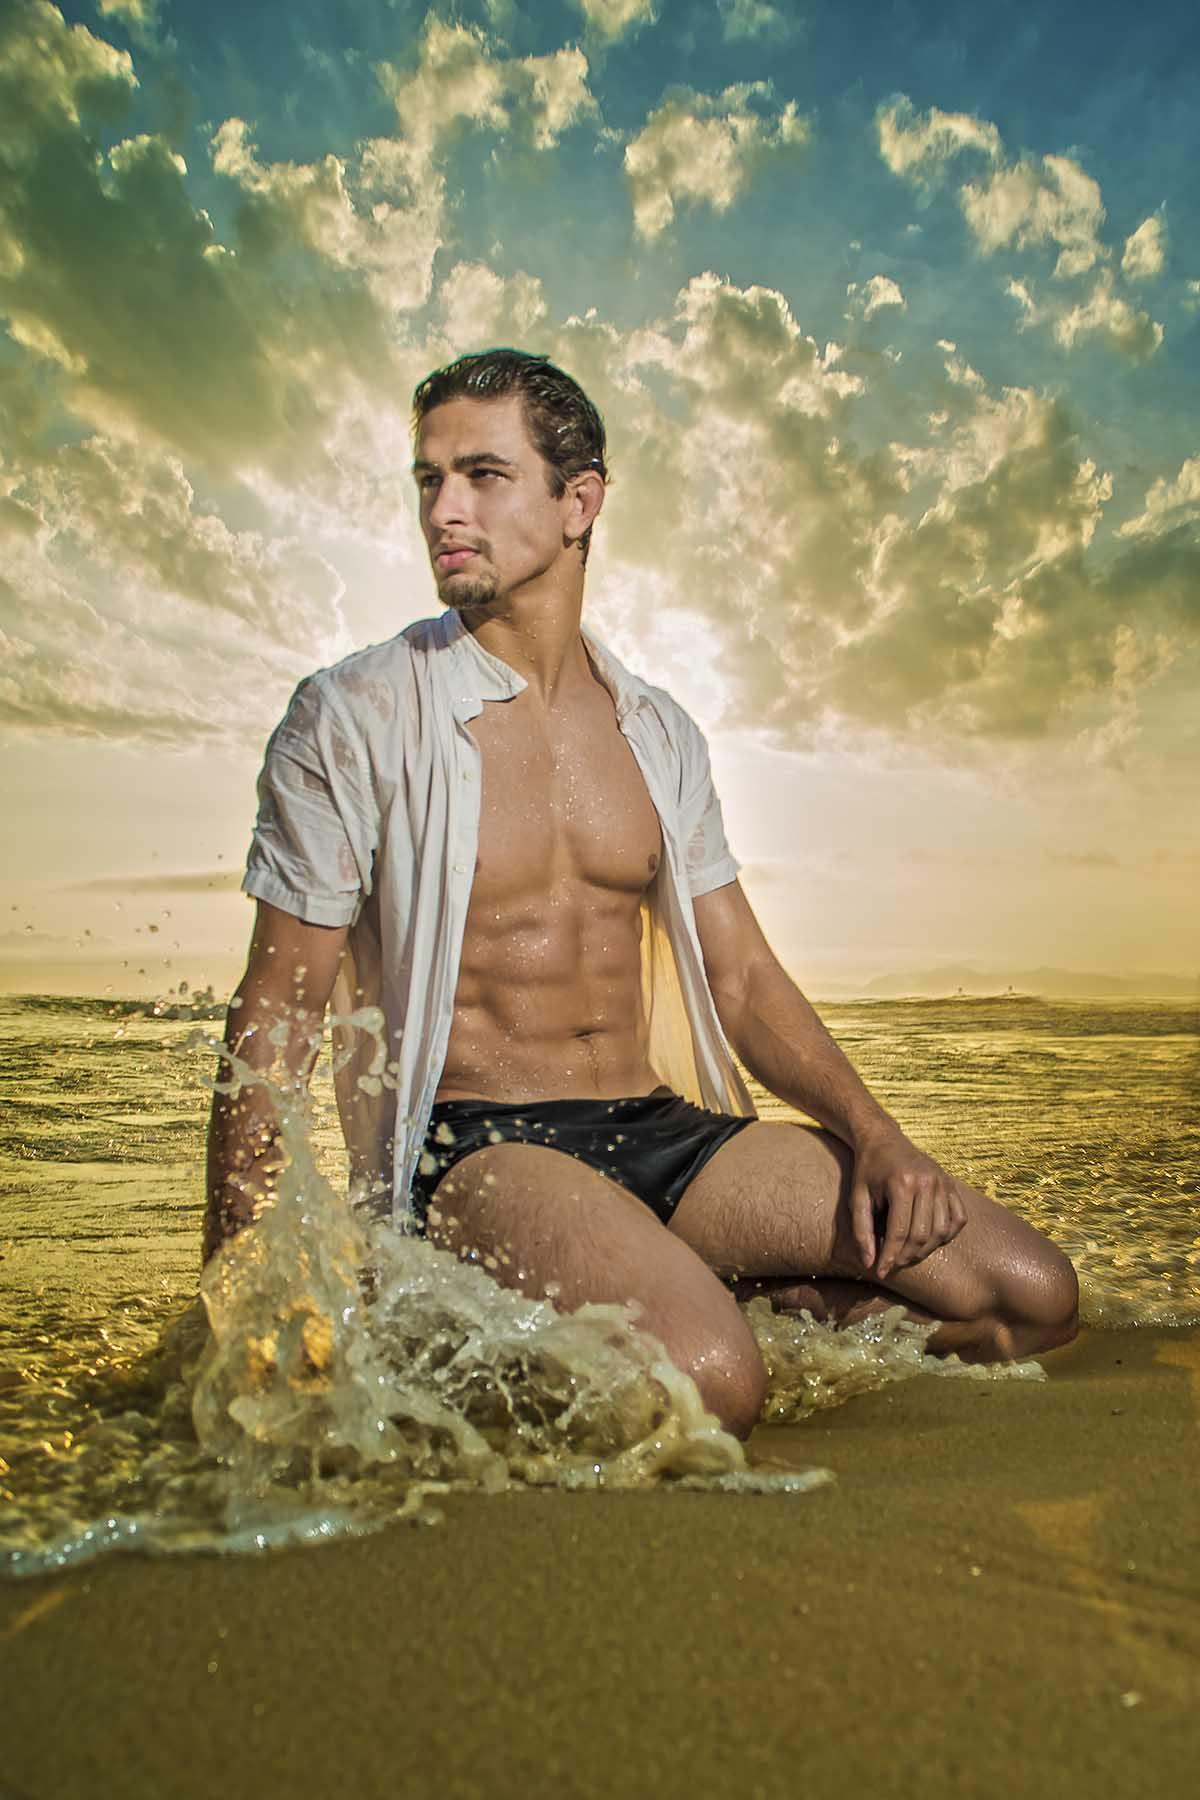 Gabriel Galindo by Carlos Costa for Brazilian Male Model